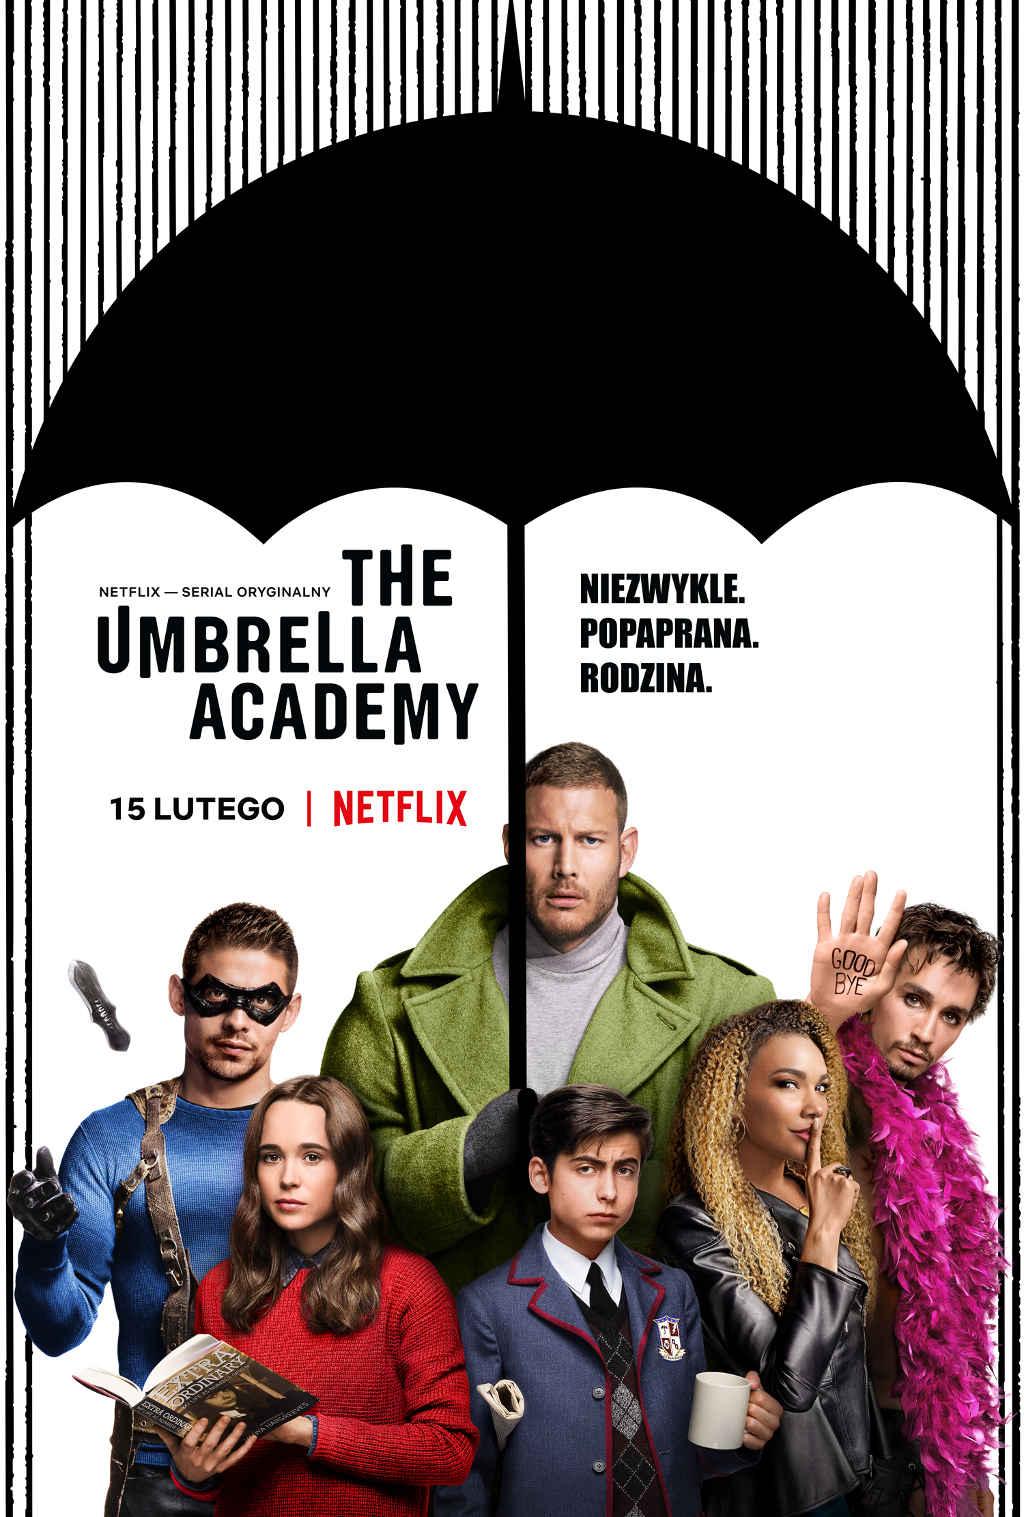 Netflix Umbrella Academy S1 Poster PL